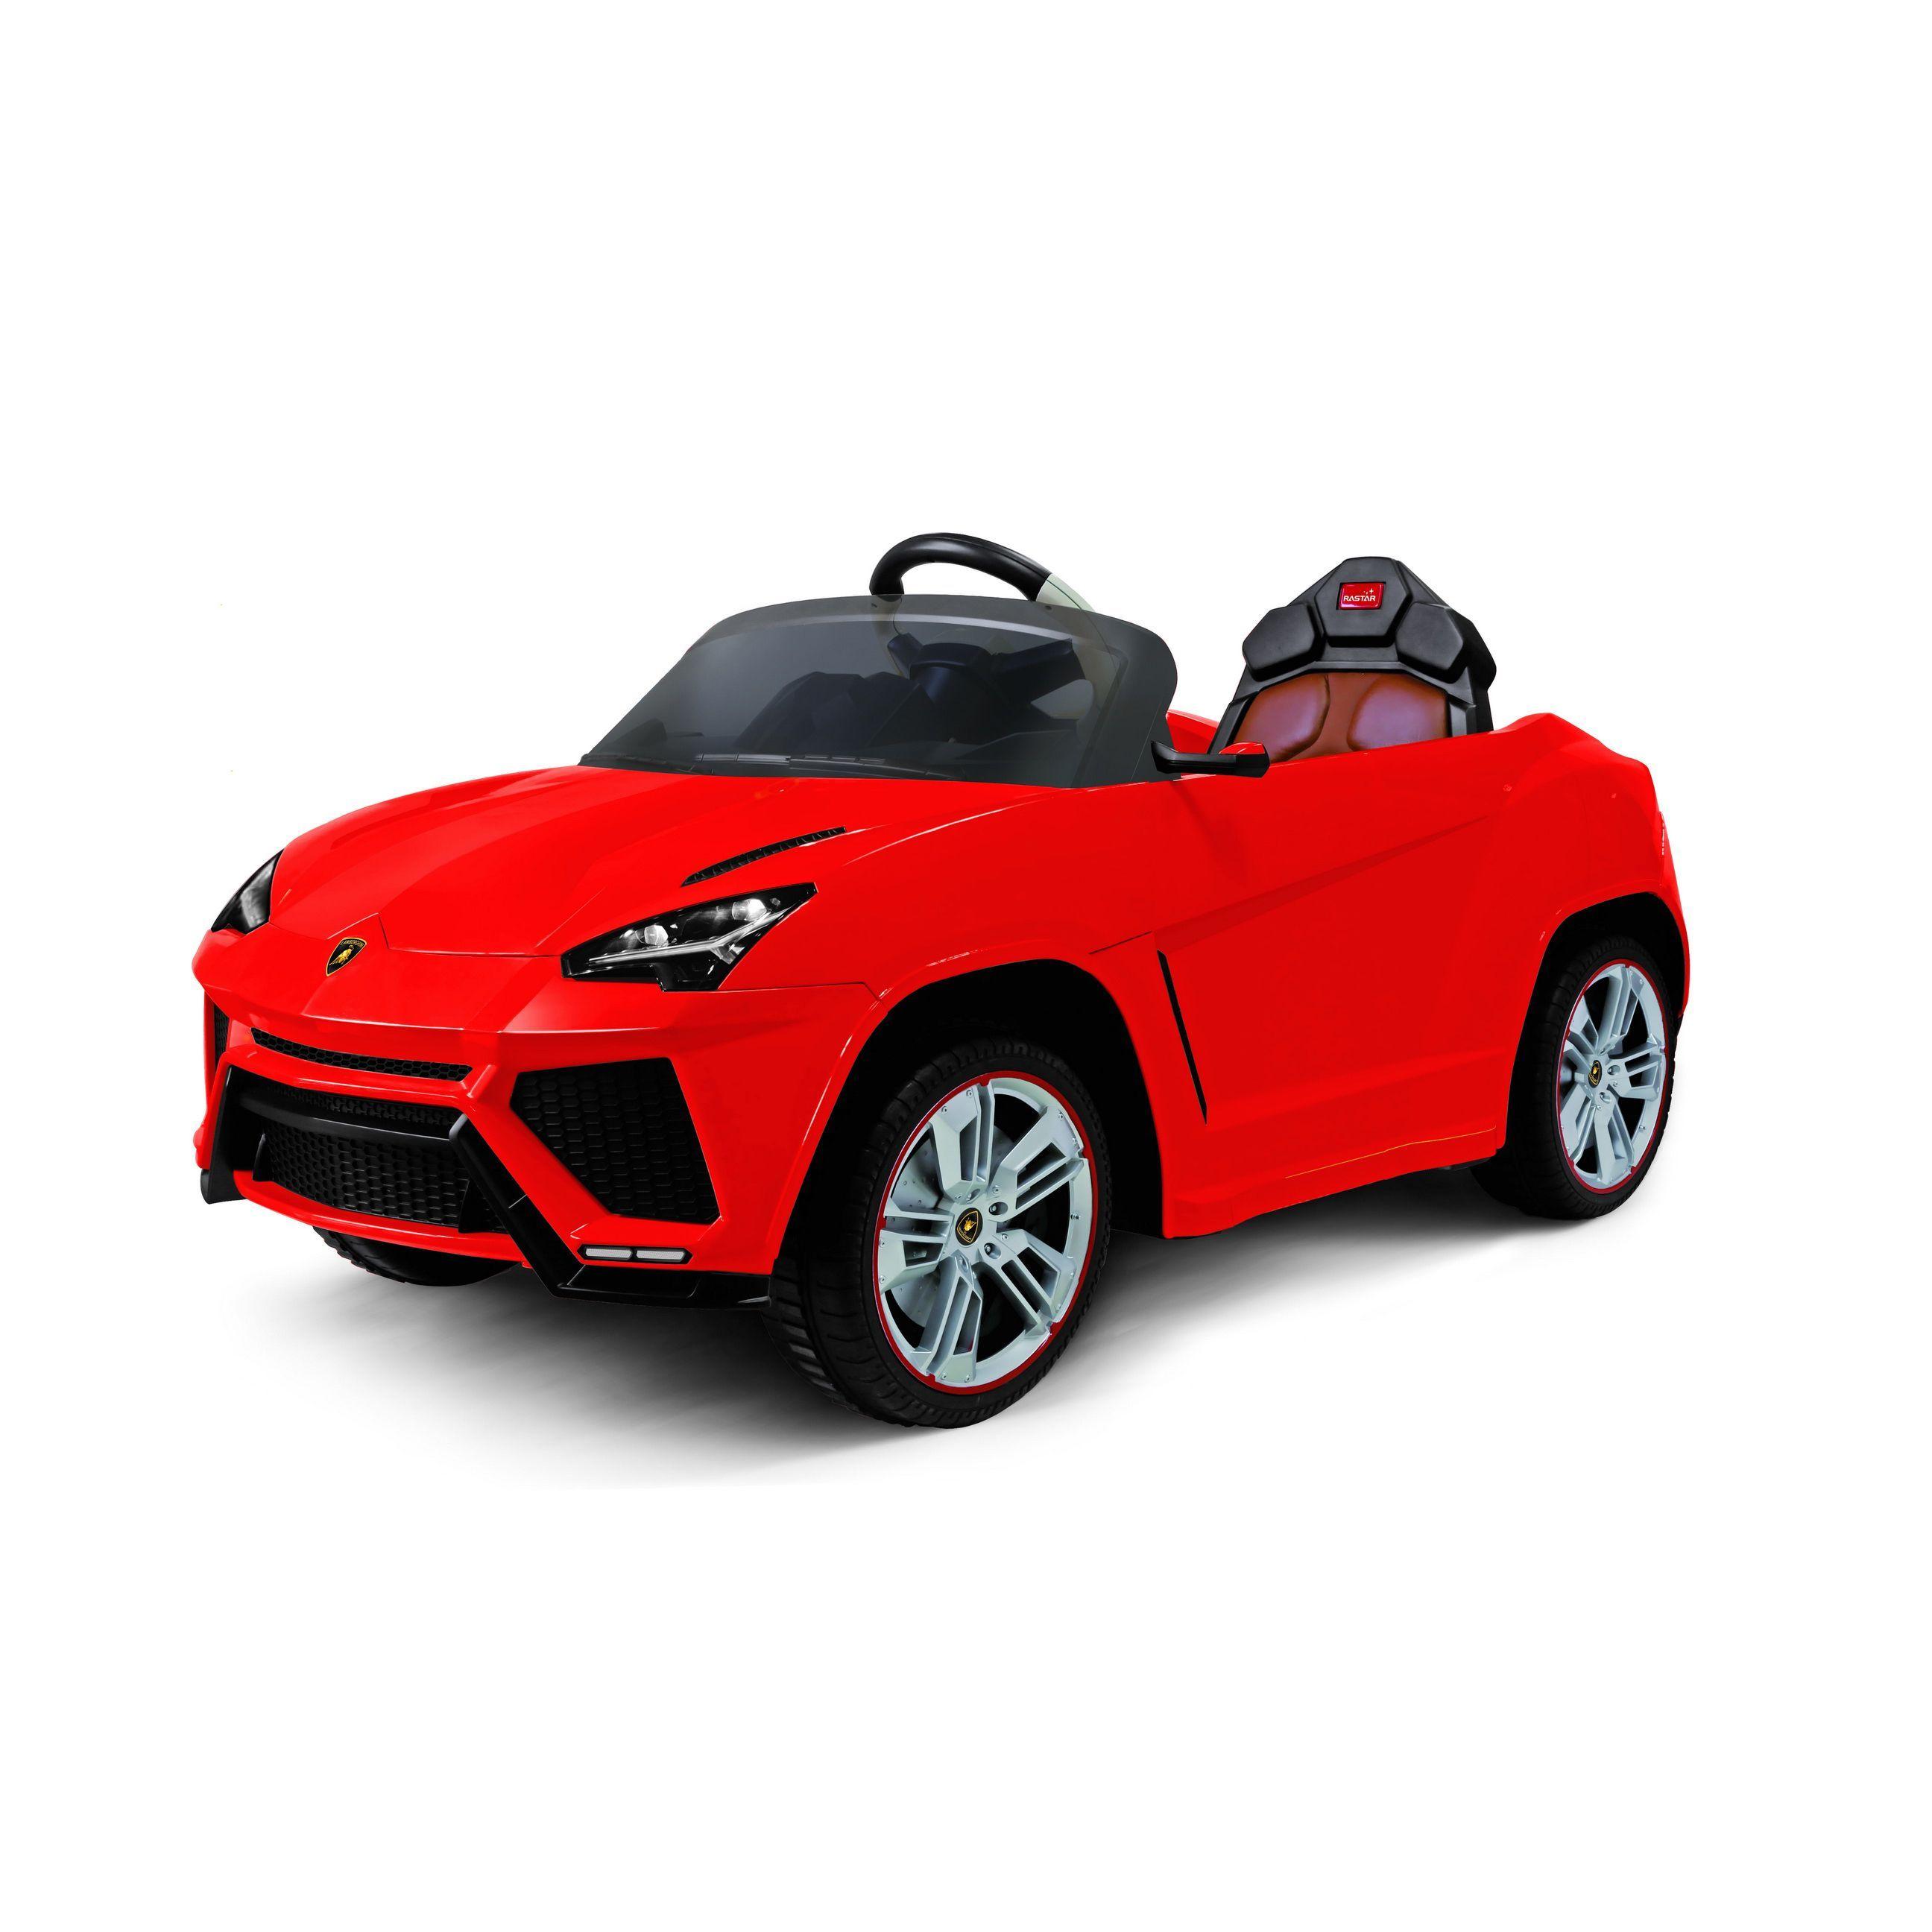 lambo hire cost south west dsw for jpp drive resized prestige lamborghini car luxury gallardo ex from insurance spyder vat